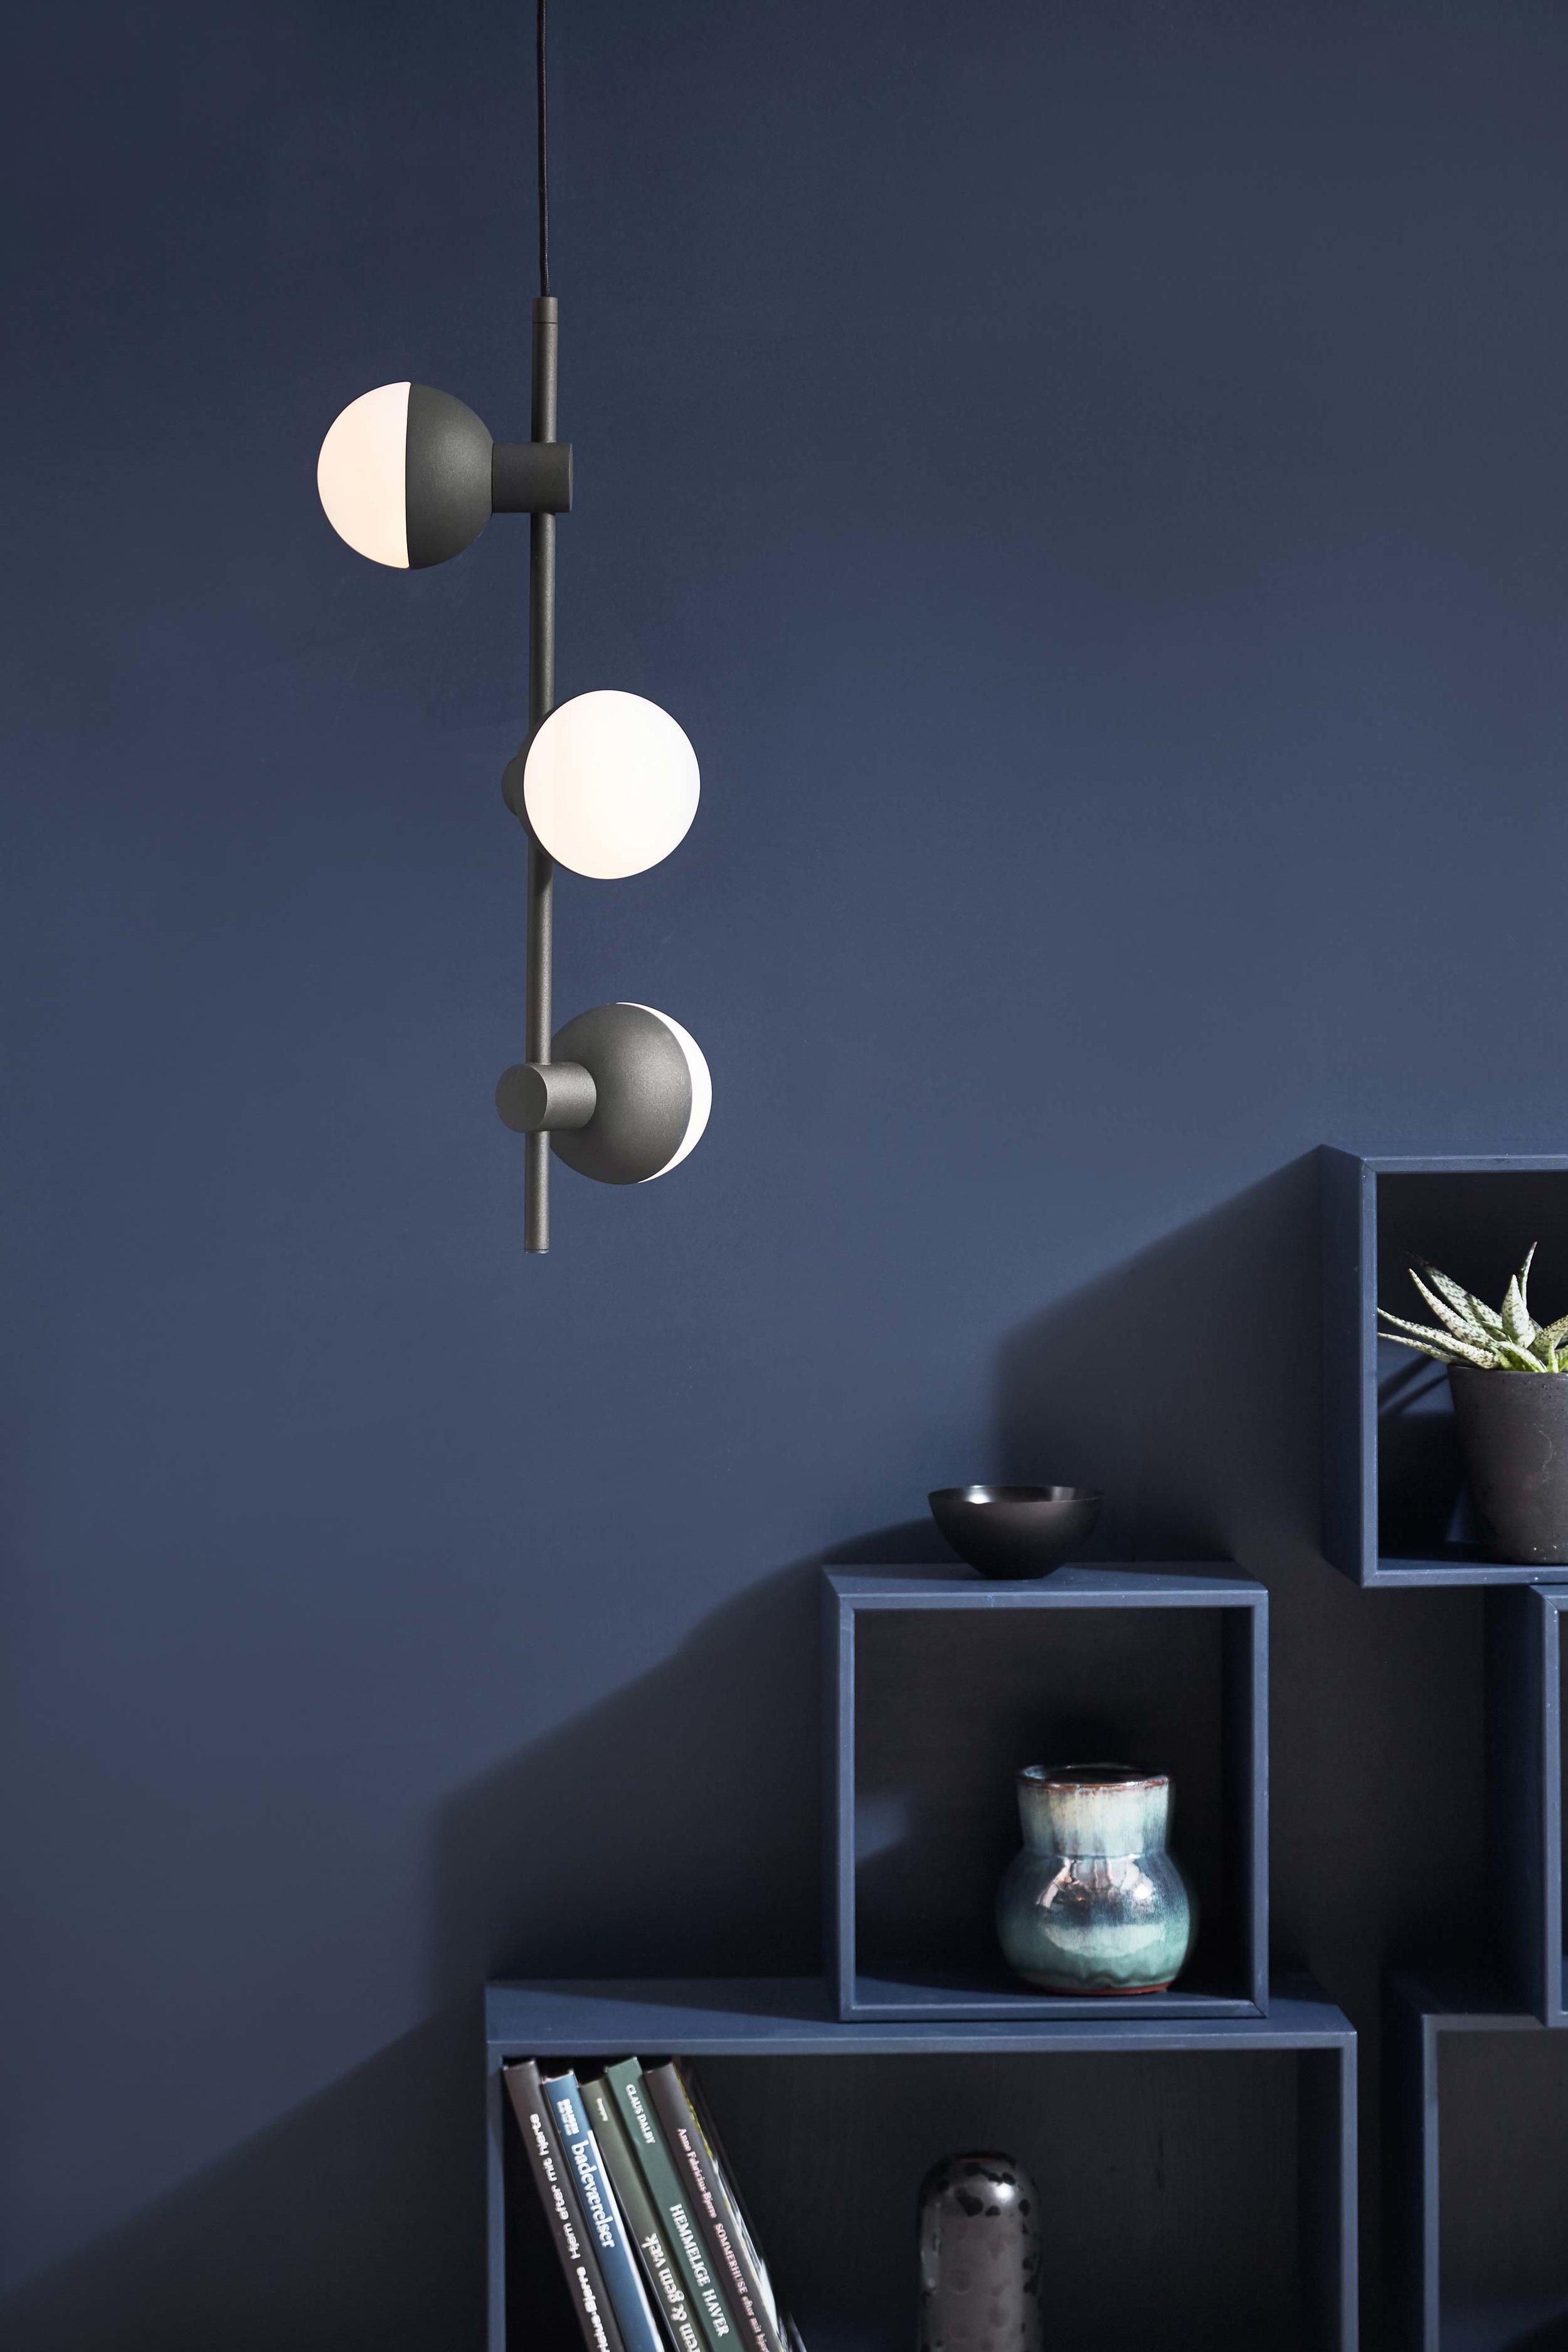 Fabian-chandelier-vertical-structure-black---lifestyle-Horsens-studio-1507.jpg